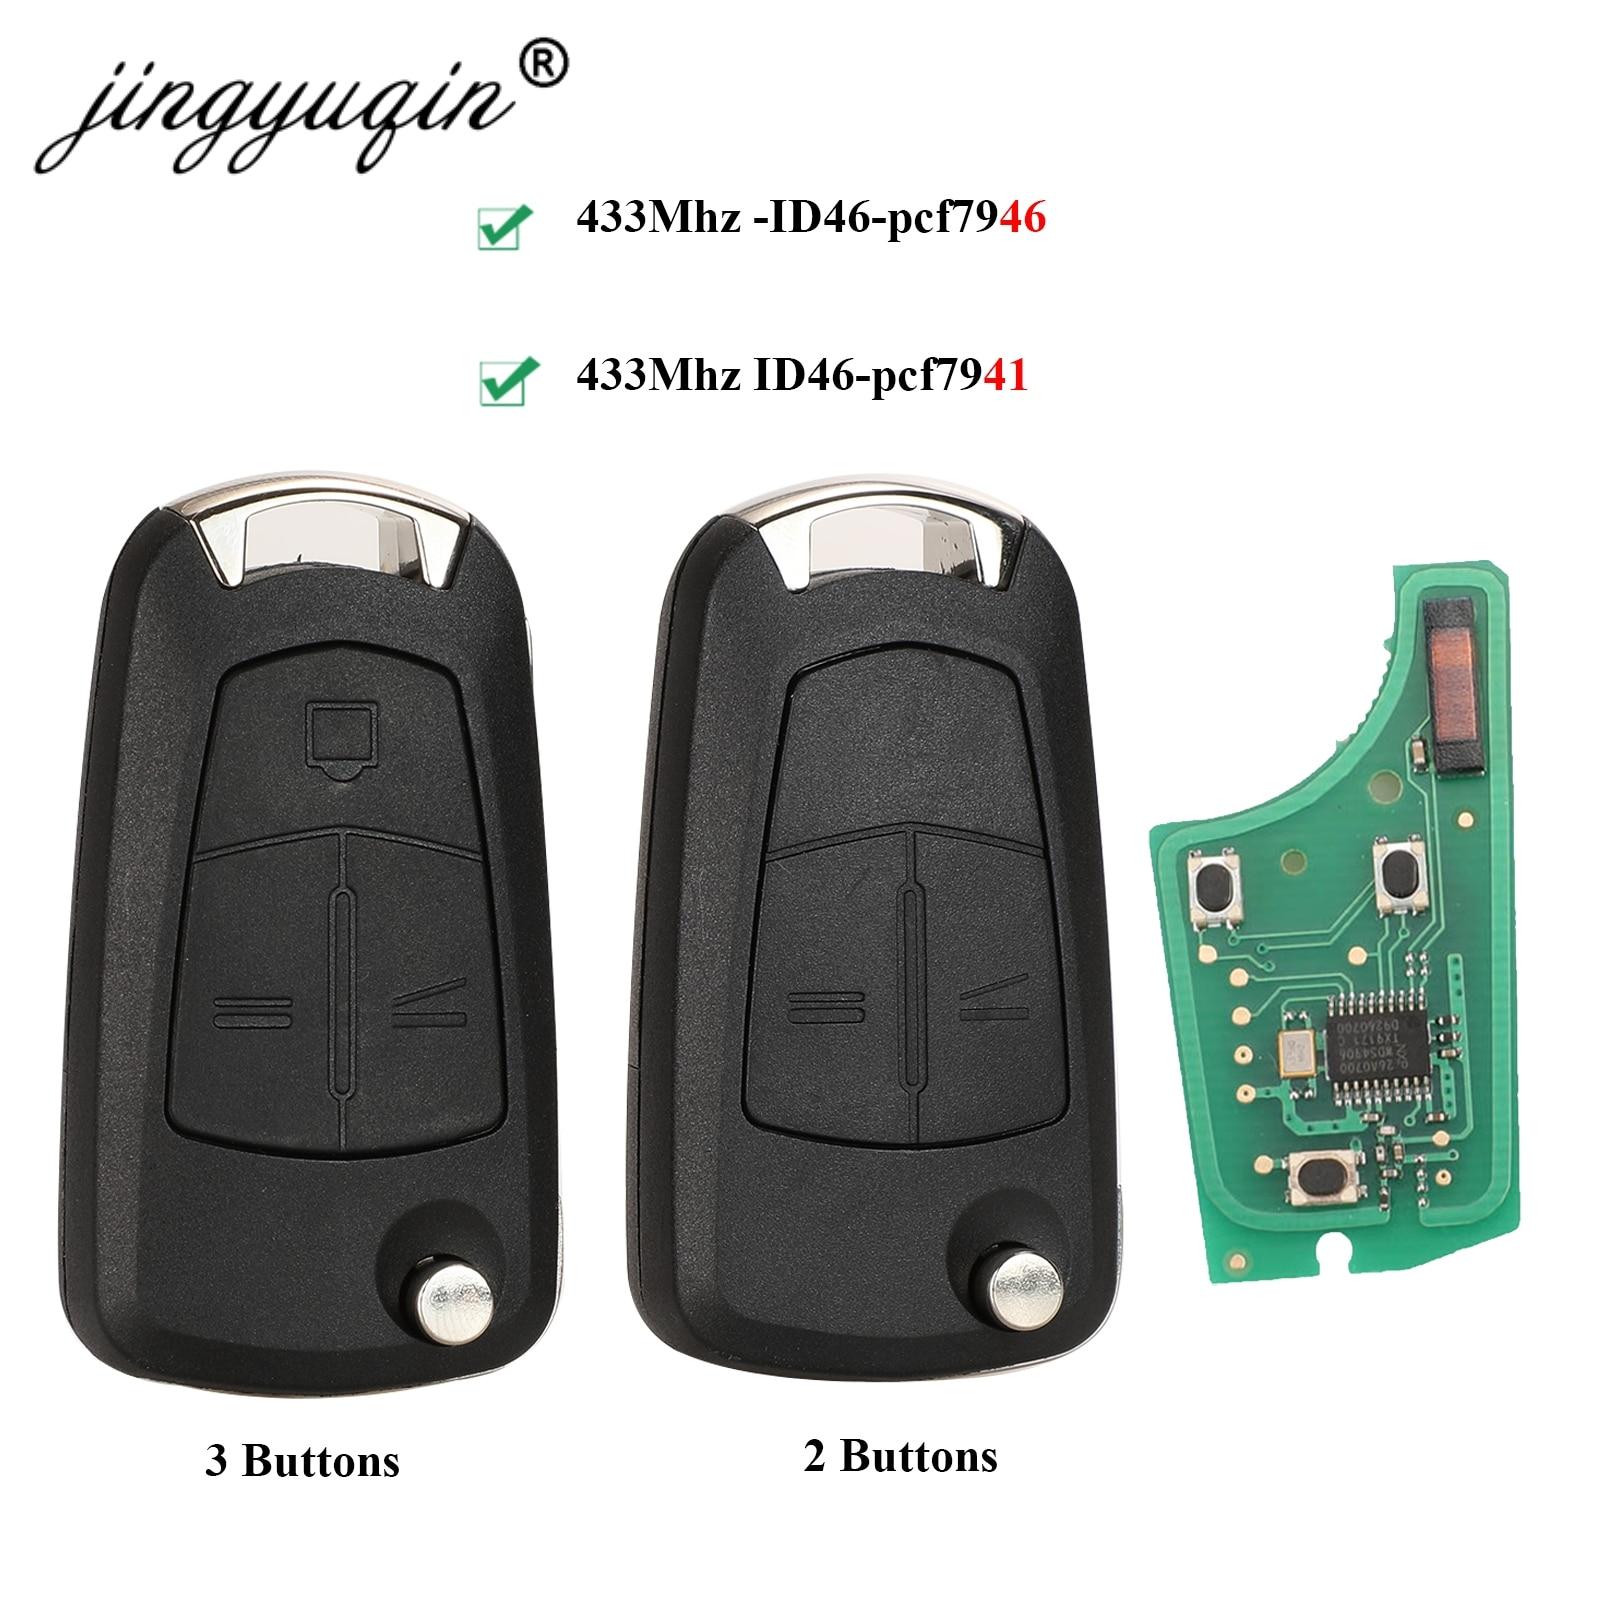 Jingyuqin Автомобильный Дистанционный ключ PCF7941 для Opel/Vauxhall Astra H 2004-2009, Zafira B 2005-2013 PCF7946 Vectra C 2002-2008 Signium